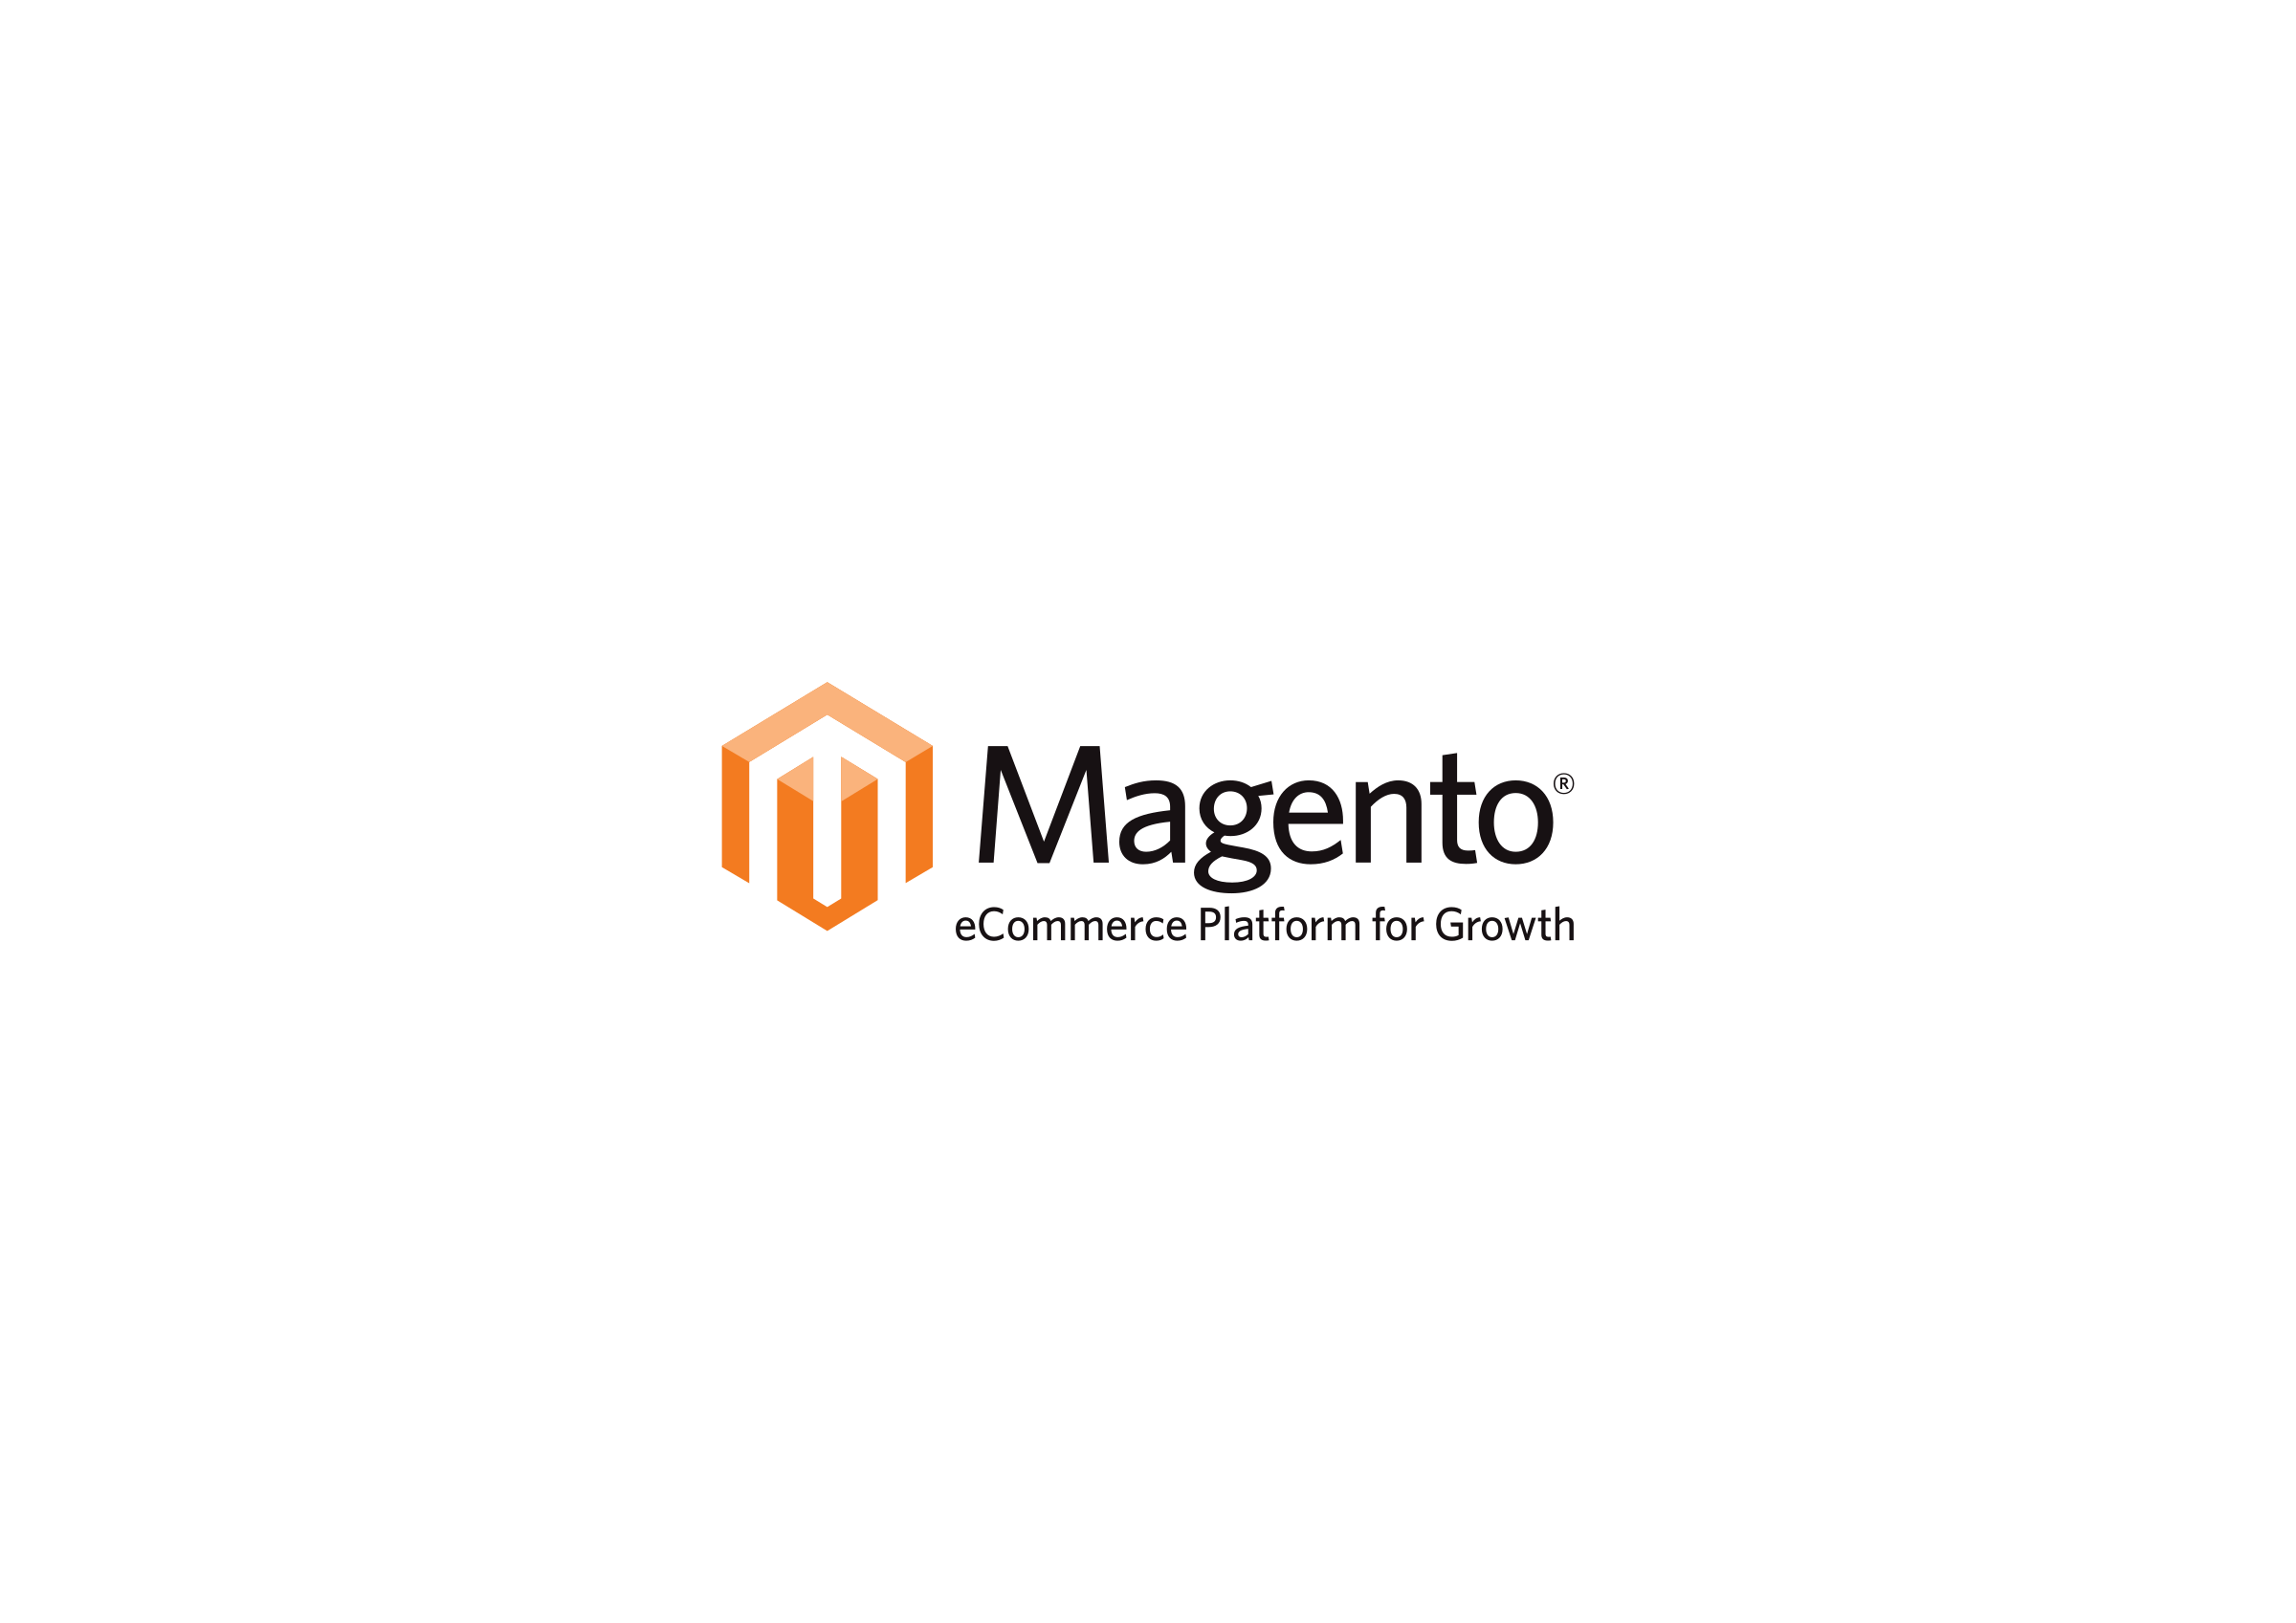 Magento Logo PNG Transparent & SVG Vector.